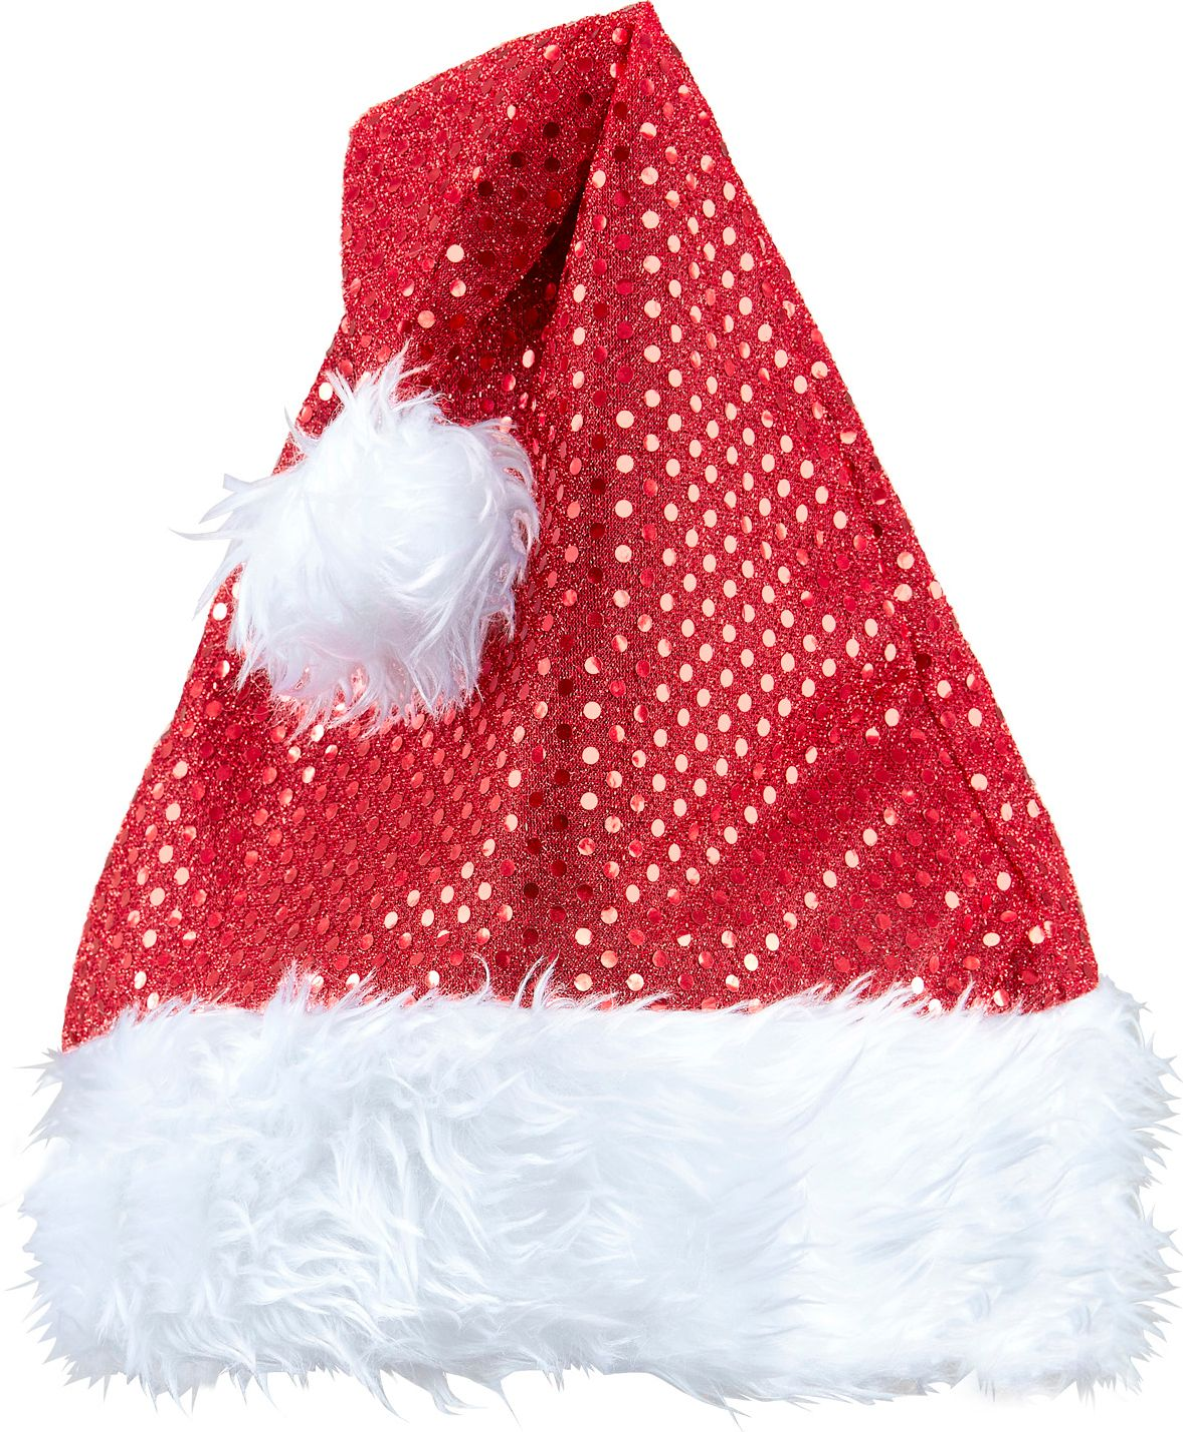 Rode pailletten kerstmuts